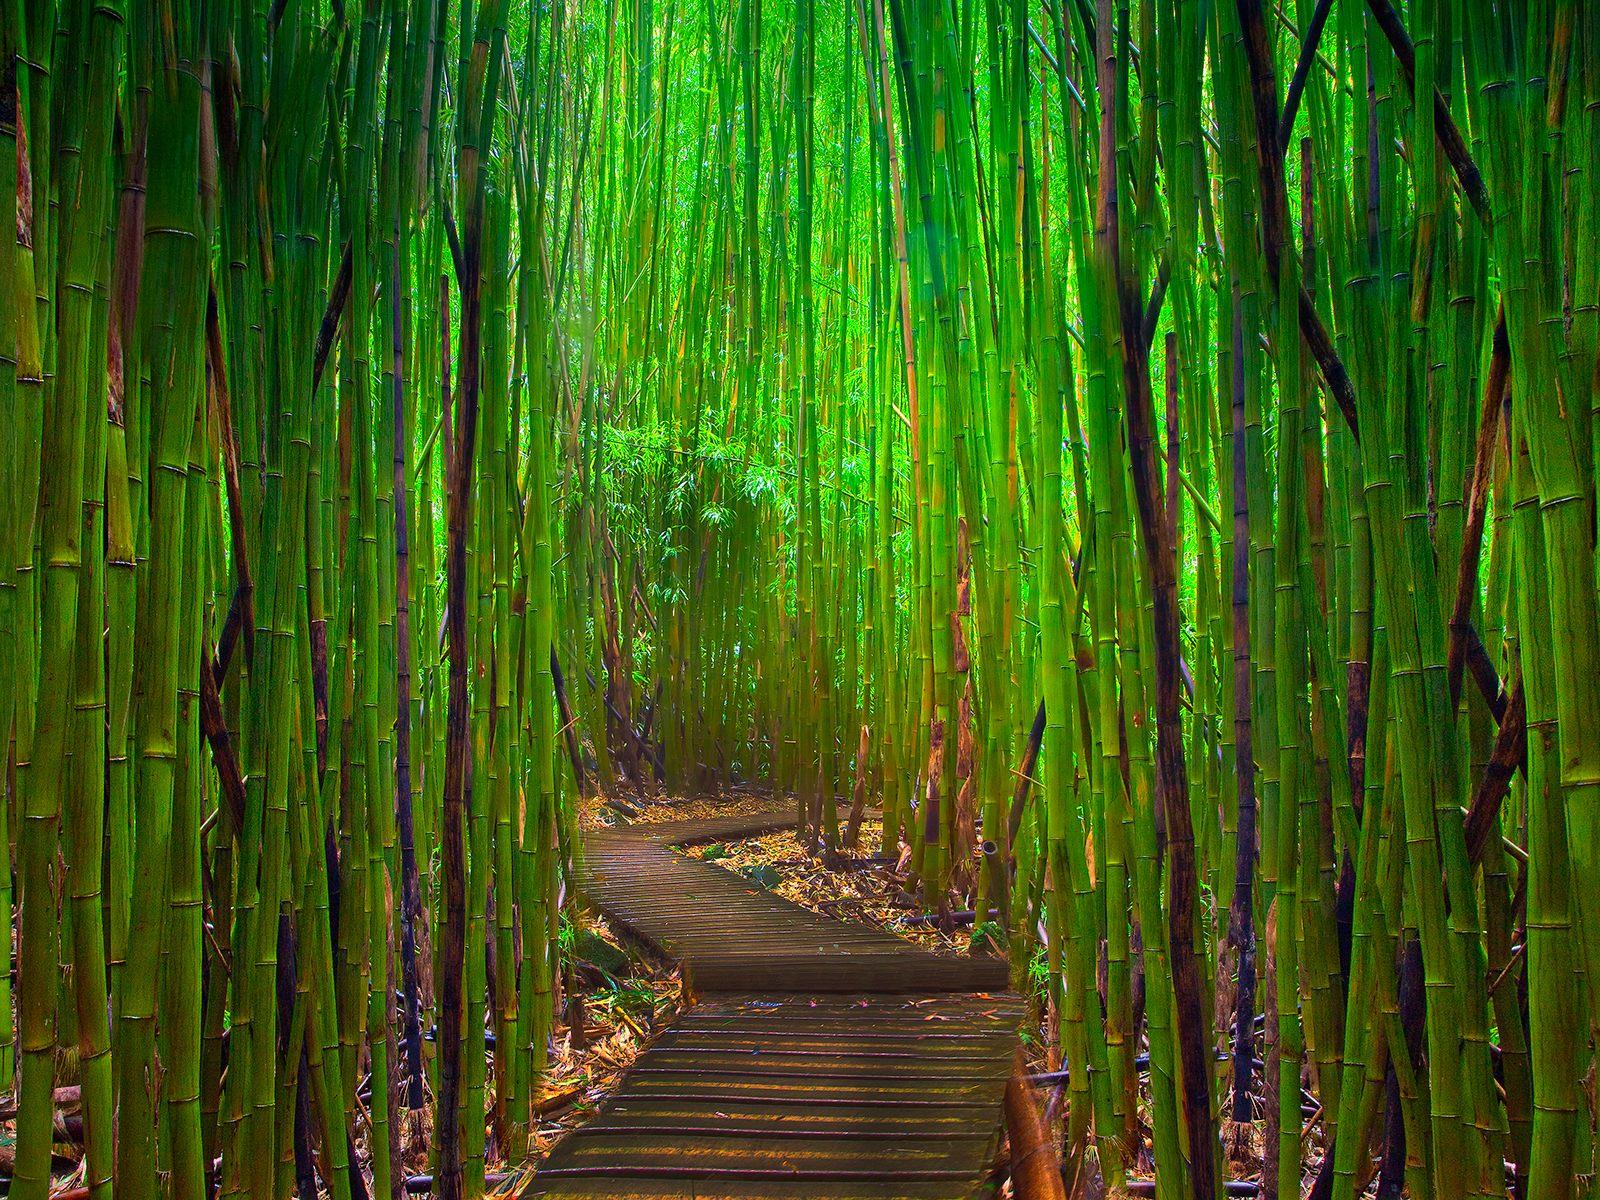 Wallpaper Proslut: High Resolution Beautiful Nature Jungle